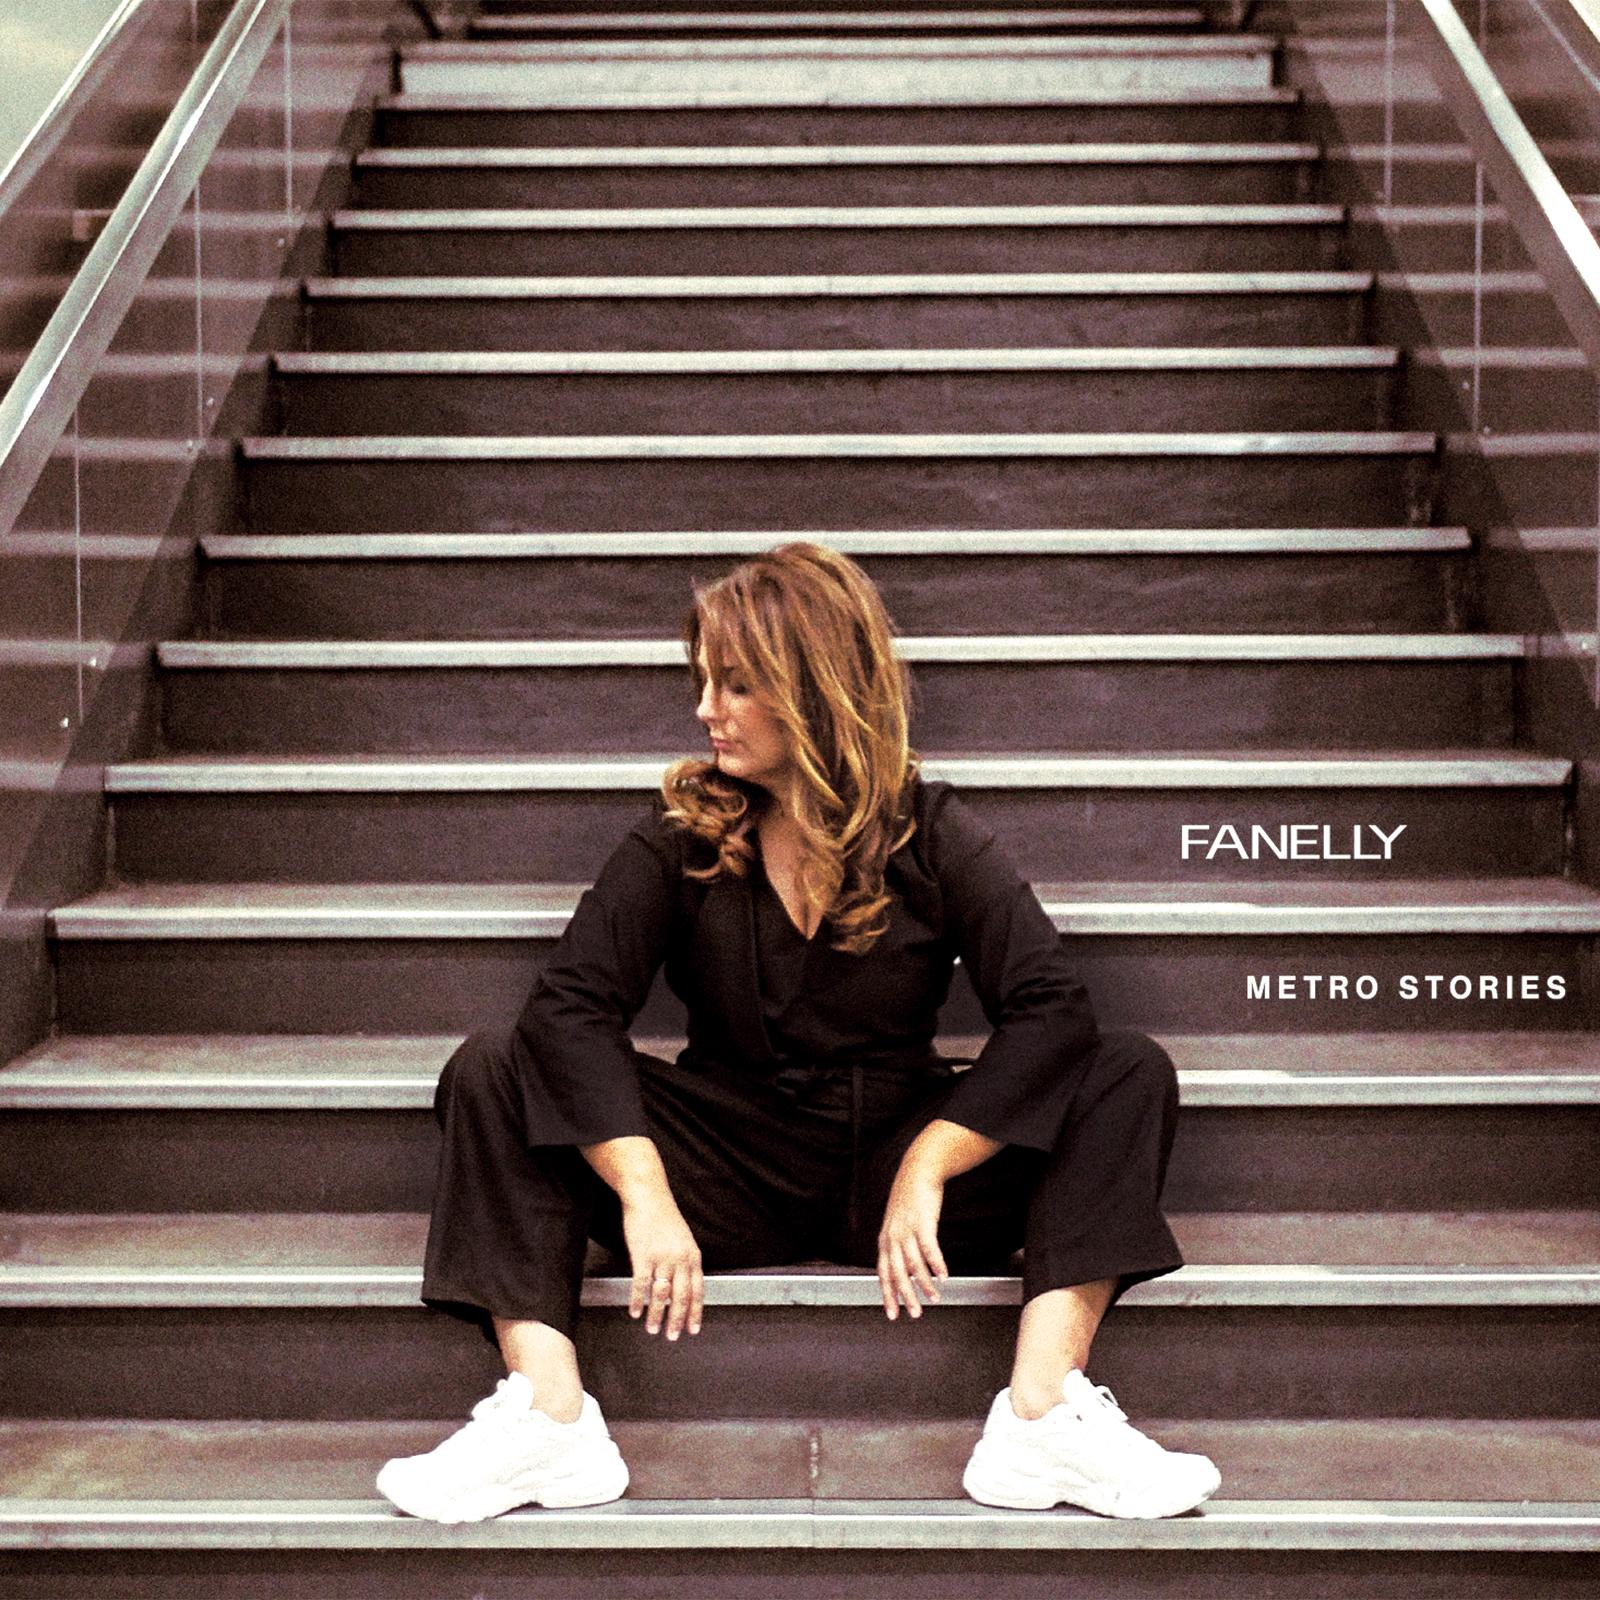 Fanelly Metro Stories Artwork DIGITAL